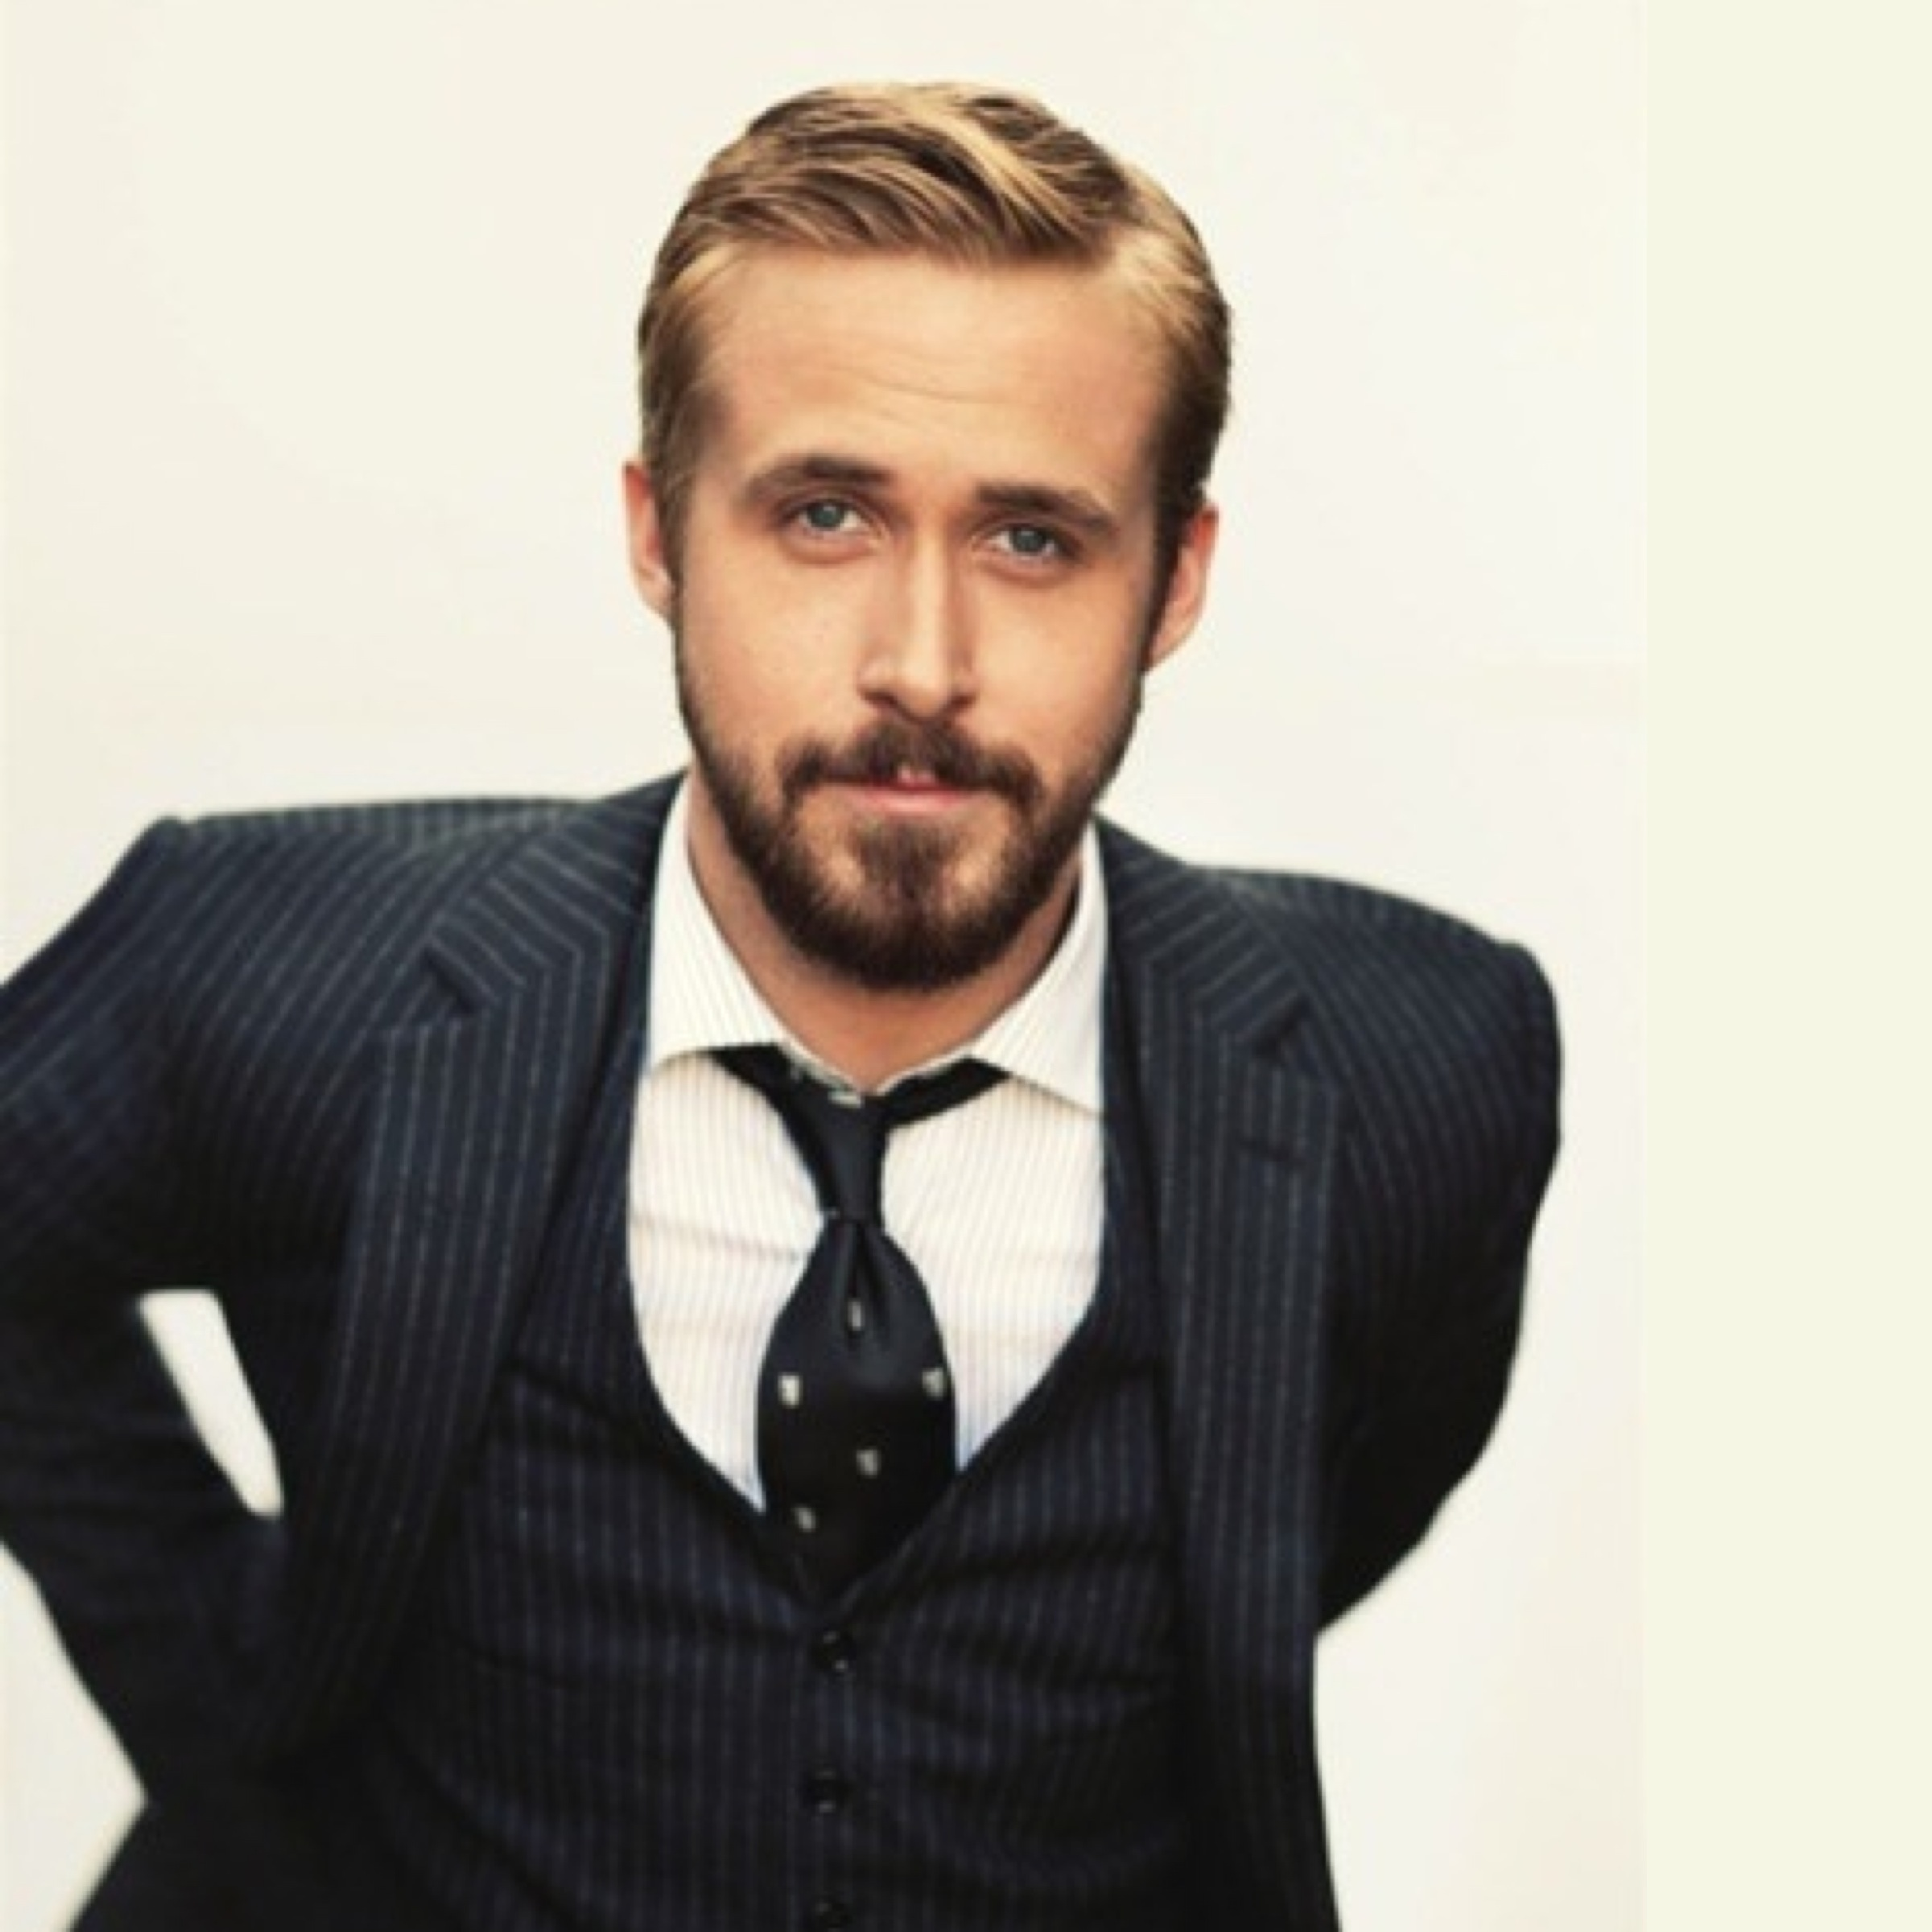 #1 (296 likes) Ryan Gosling (well worth of #1 spot)